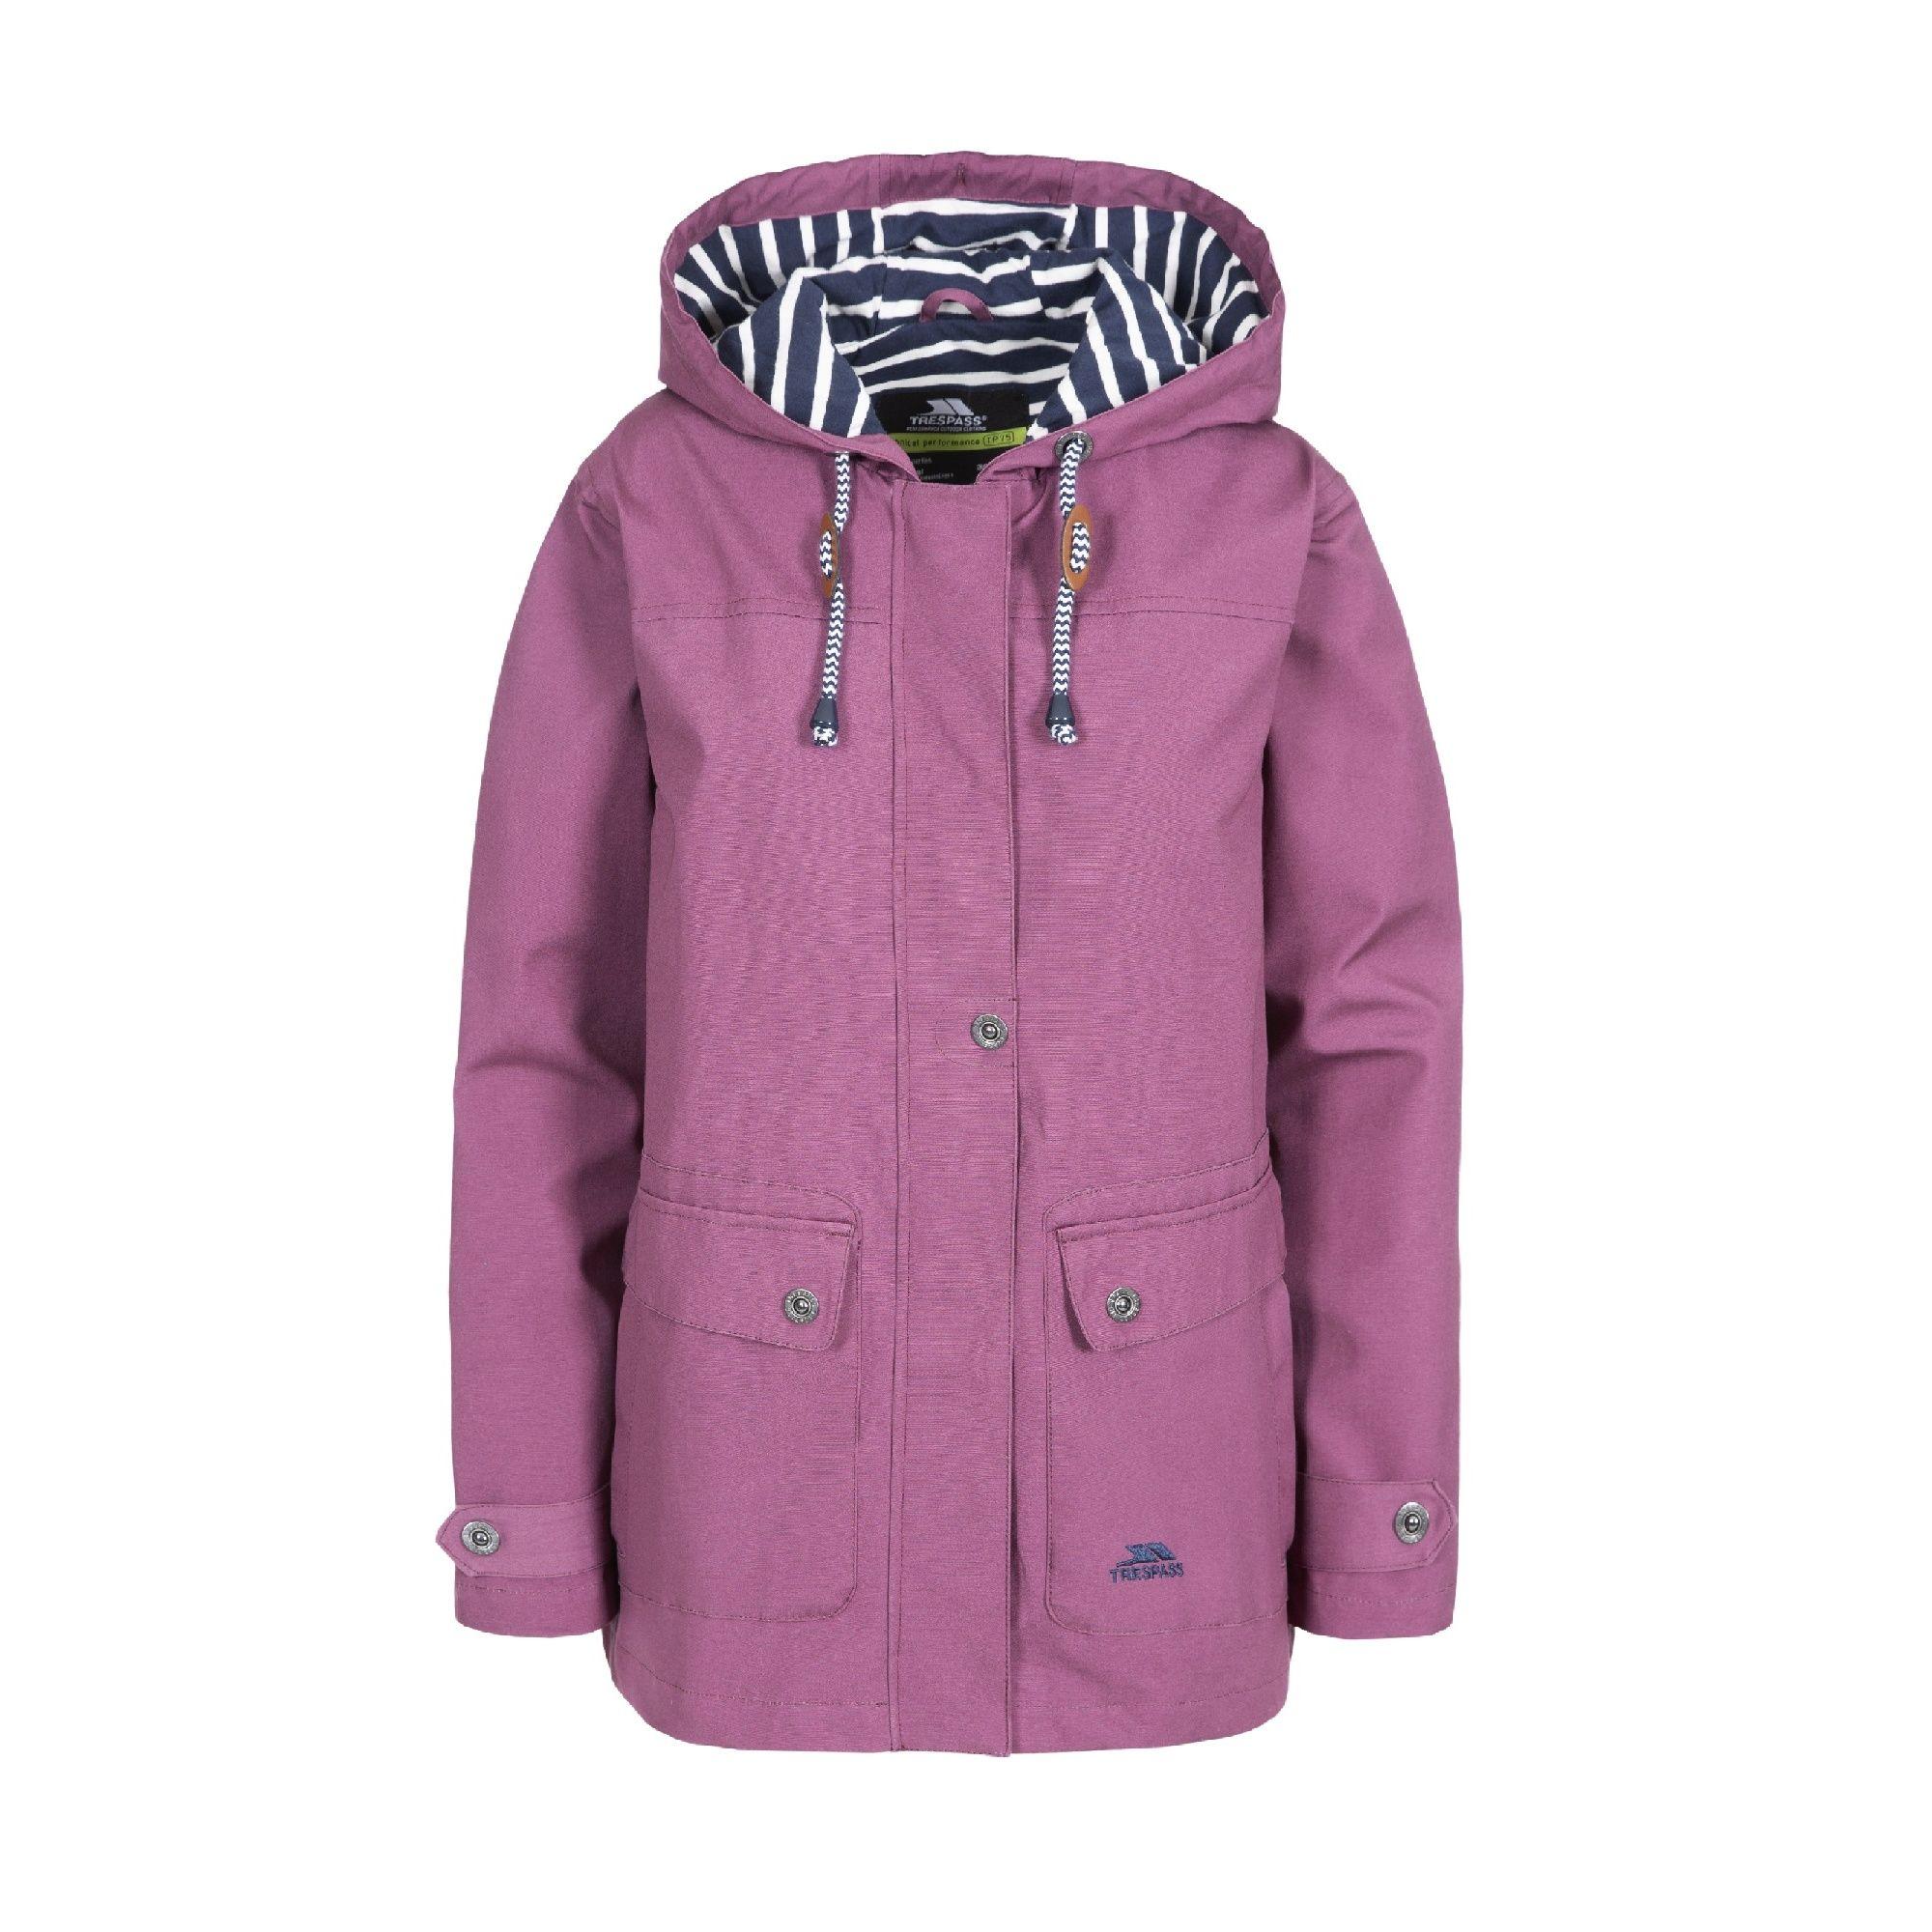 Trespass Women's Seawater Waterproof Jacket